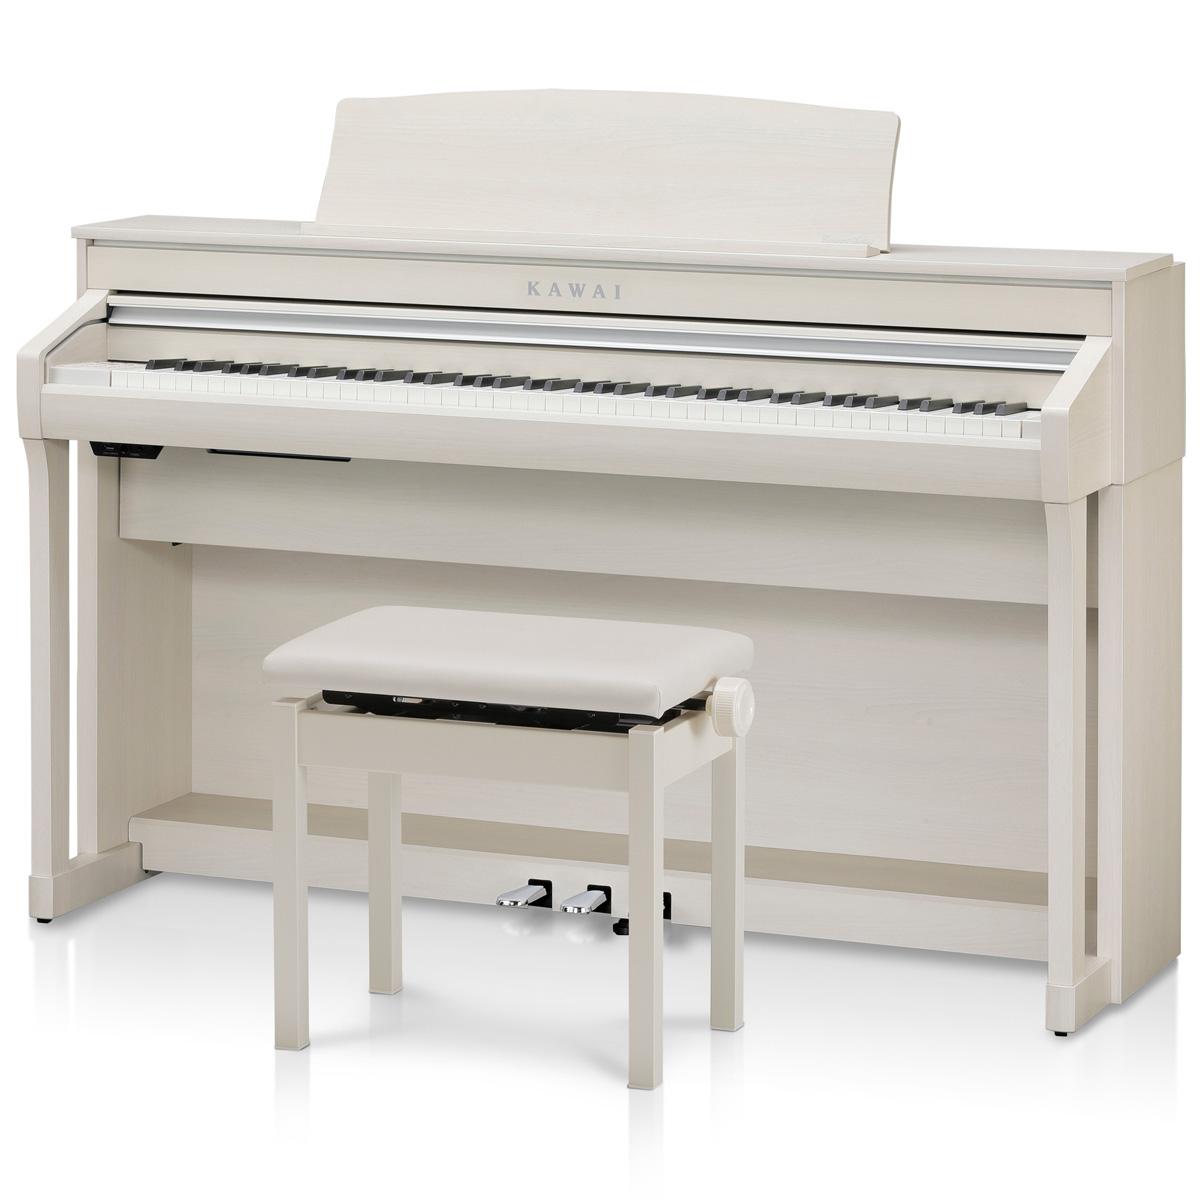 KAWAI カワイ / CA58A プレミアムホワイトメール調仕上げ 電子ピアノ (CA-58)【全国組立設置無料】【代引き不可】